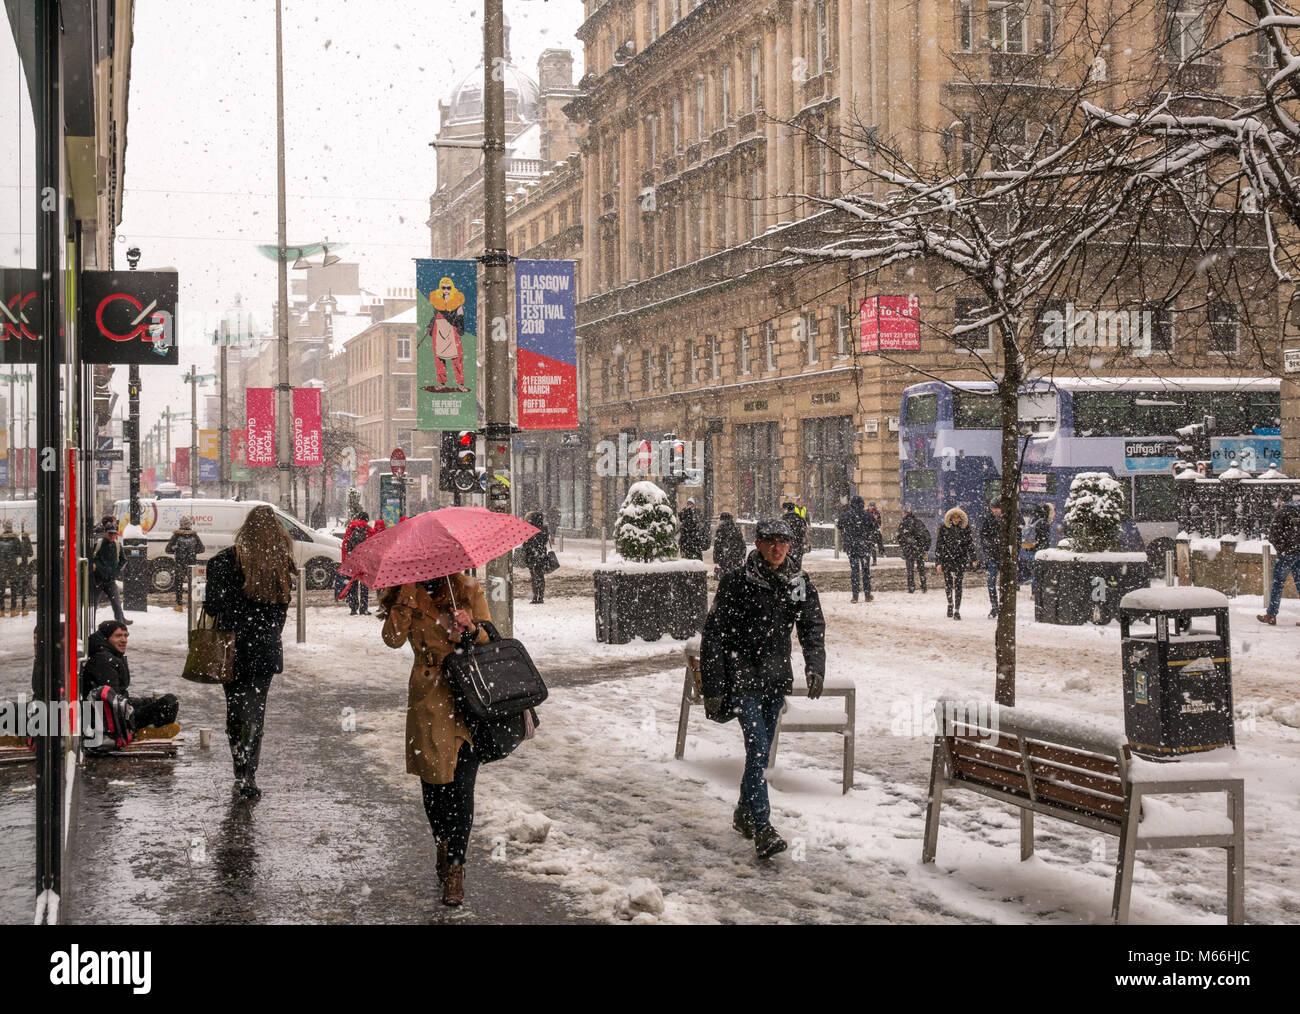 snowing-buchanan-street-central-glasgow-